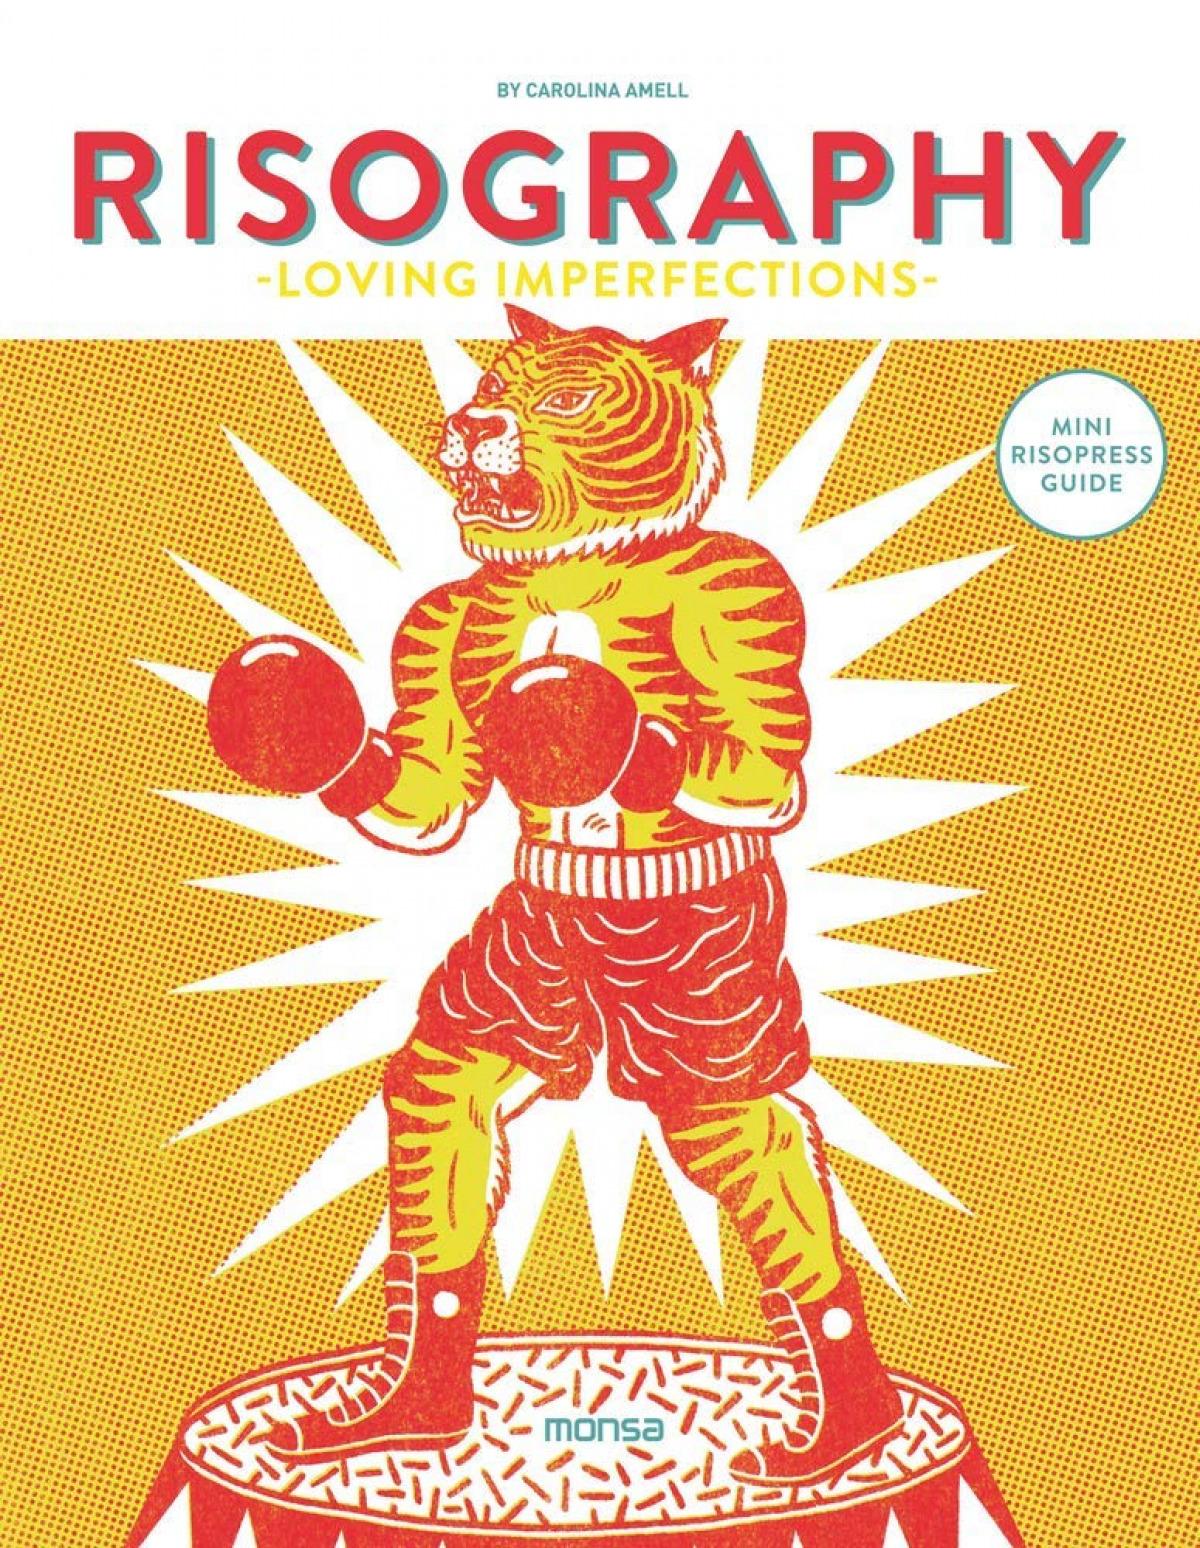 RISOGRAPHY 9788416500581